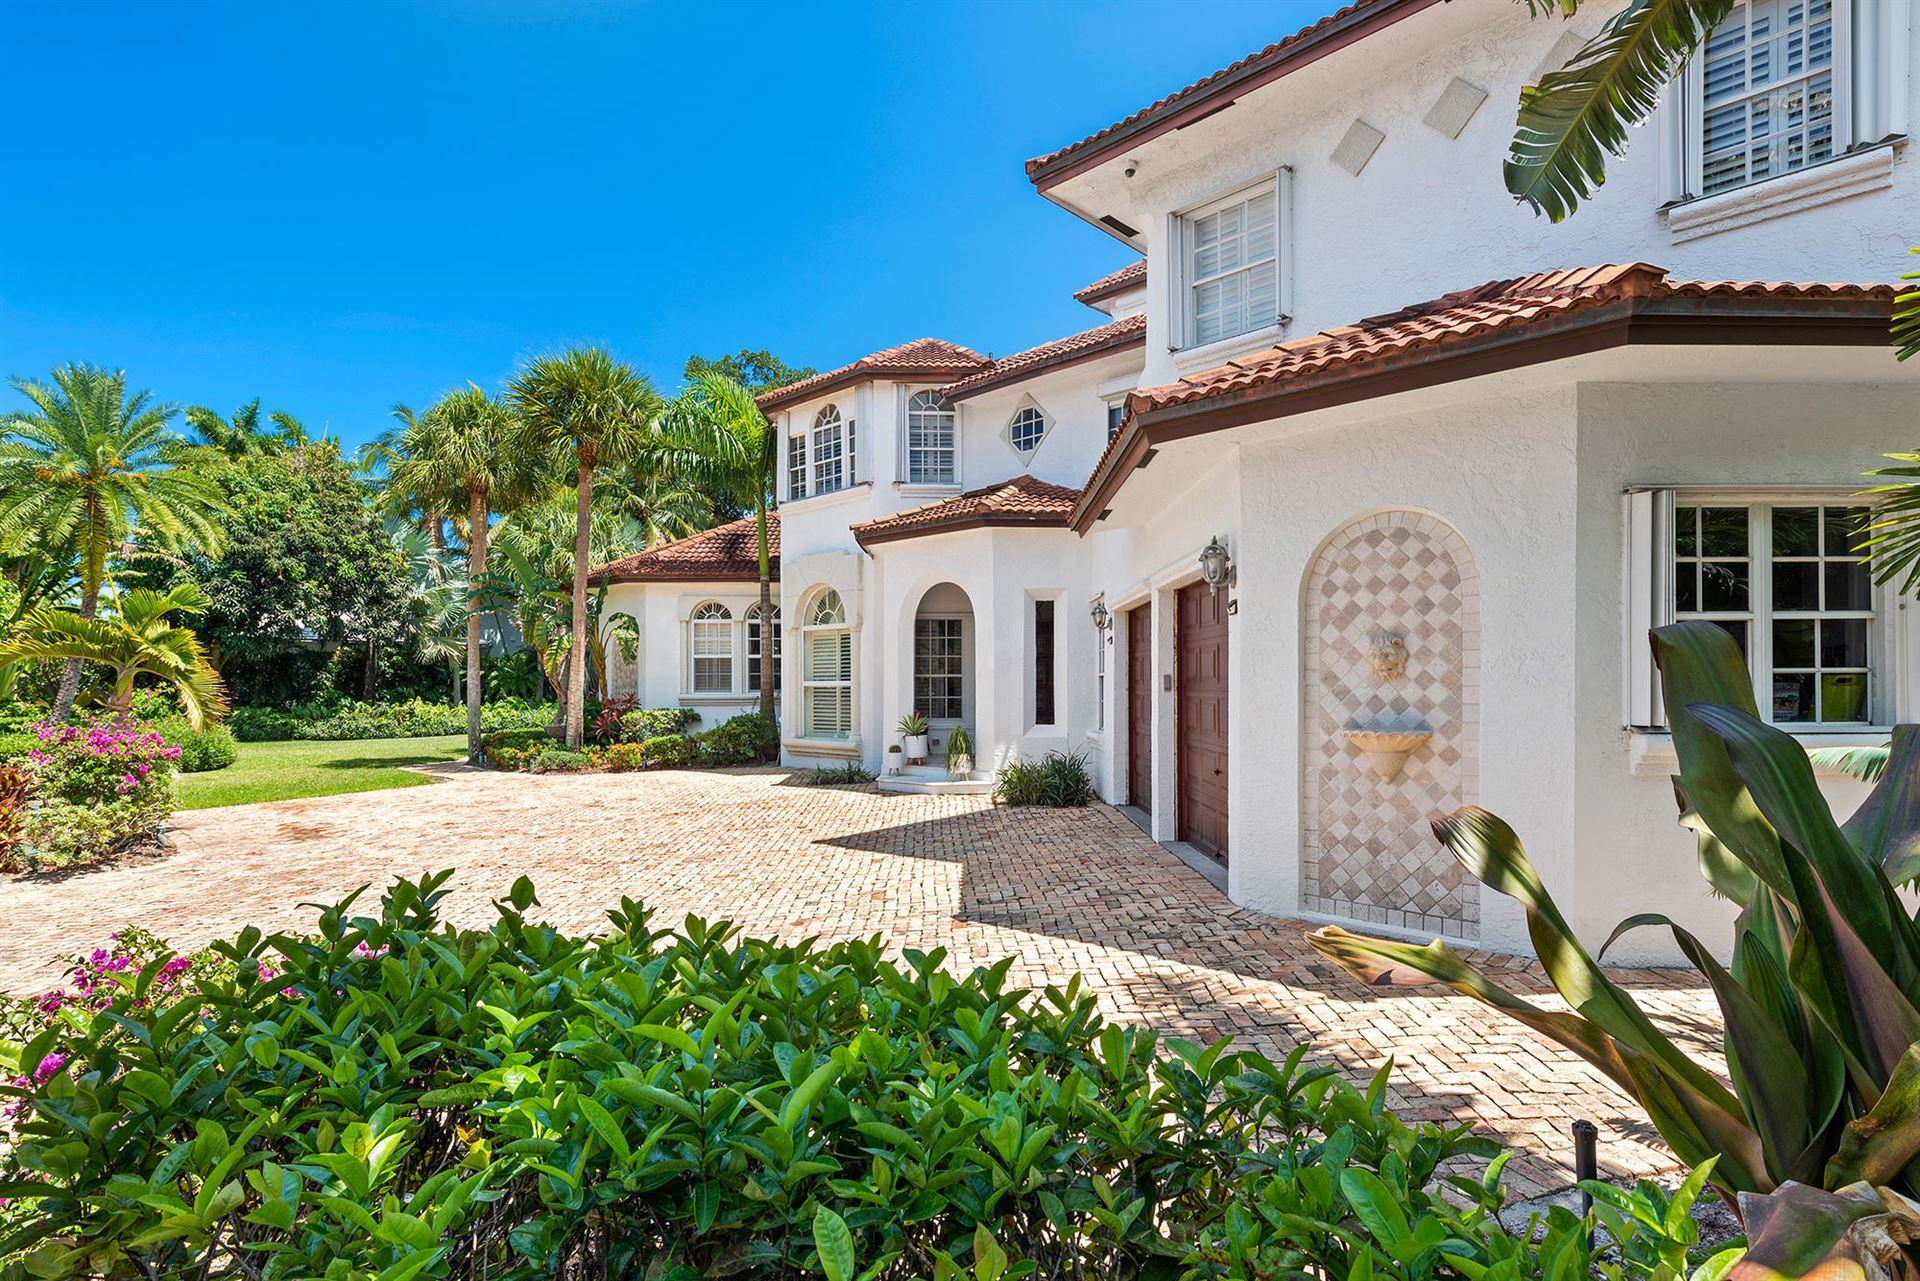 Photo of 2420 Sea Island Drive, Fort Lauderdale, FL 33301 (MLS # RX-10715071)